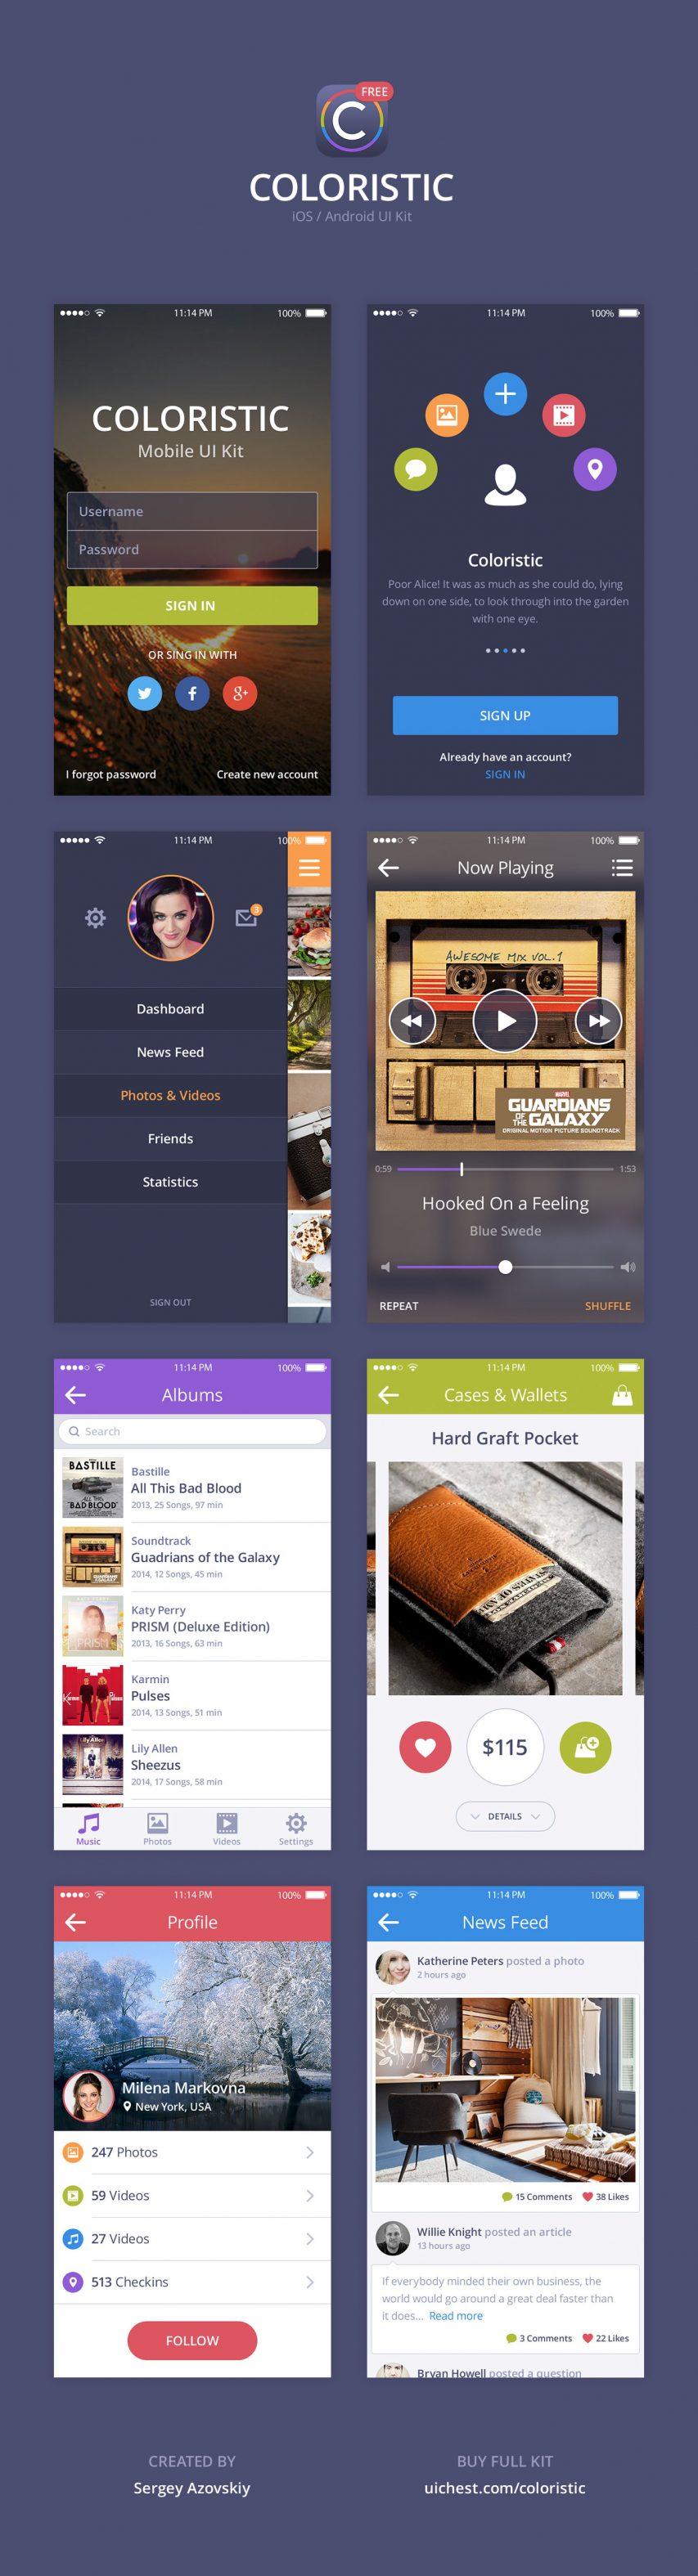 Colorful App UI Kit PSD